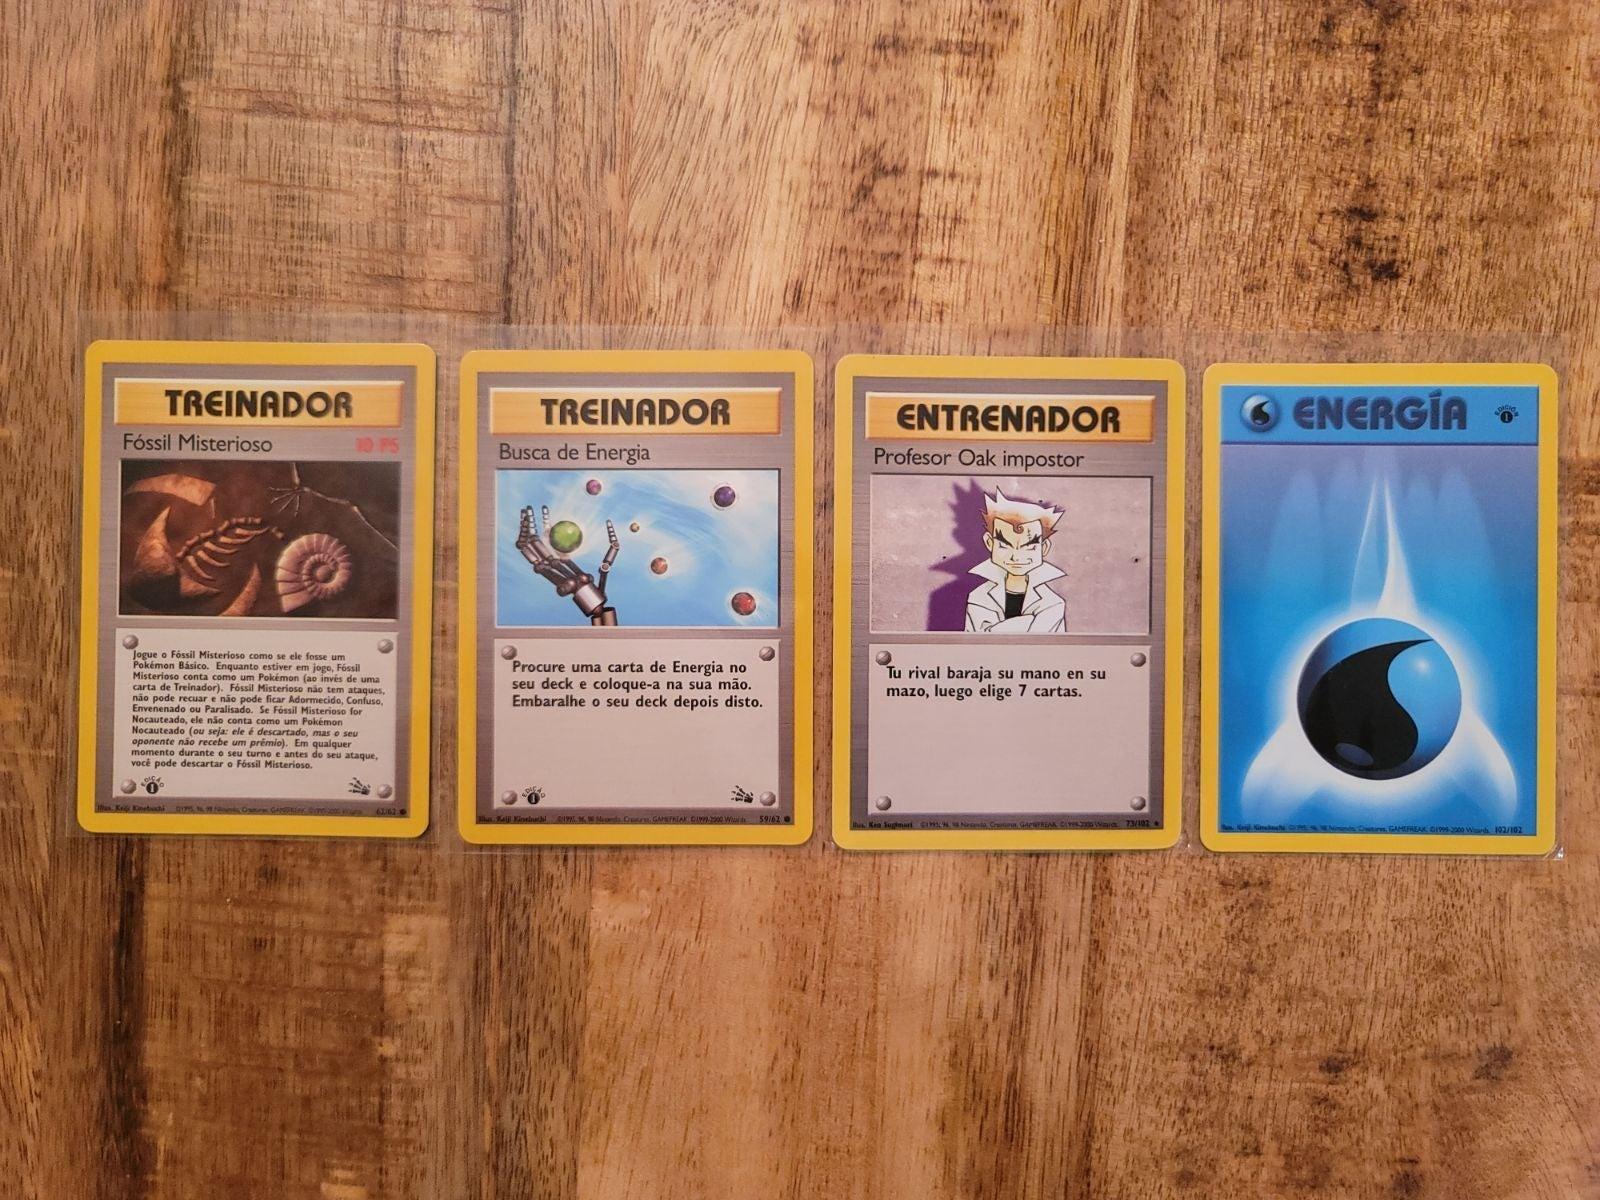 Pokemon cards 1st edition